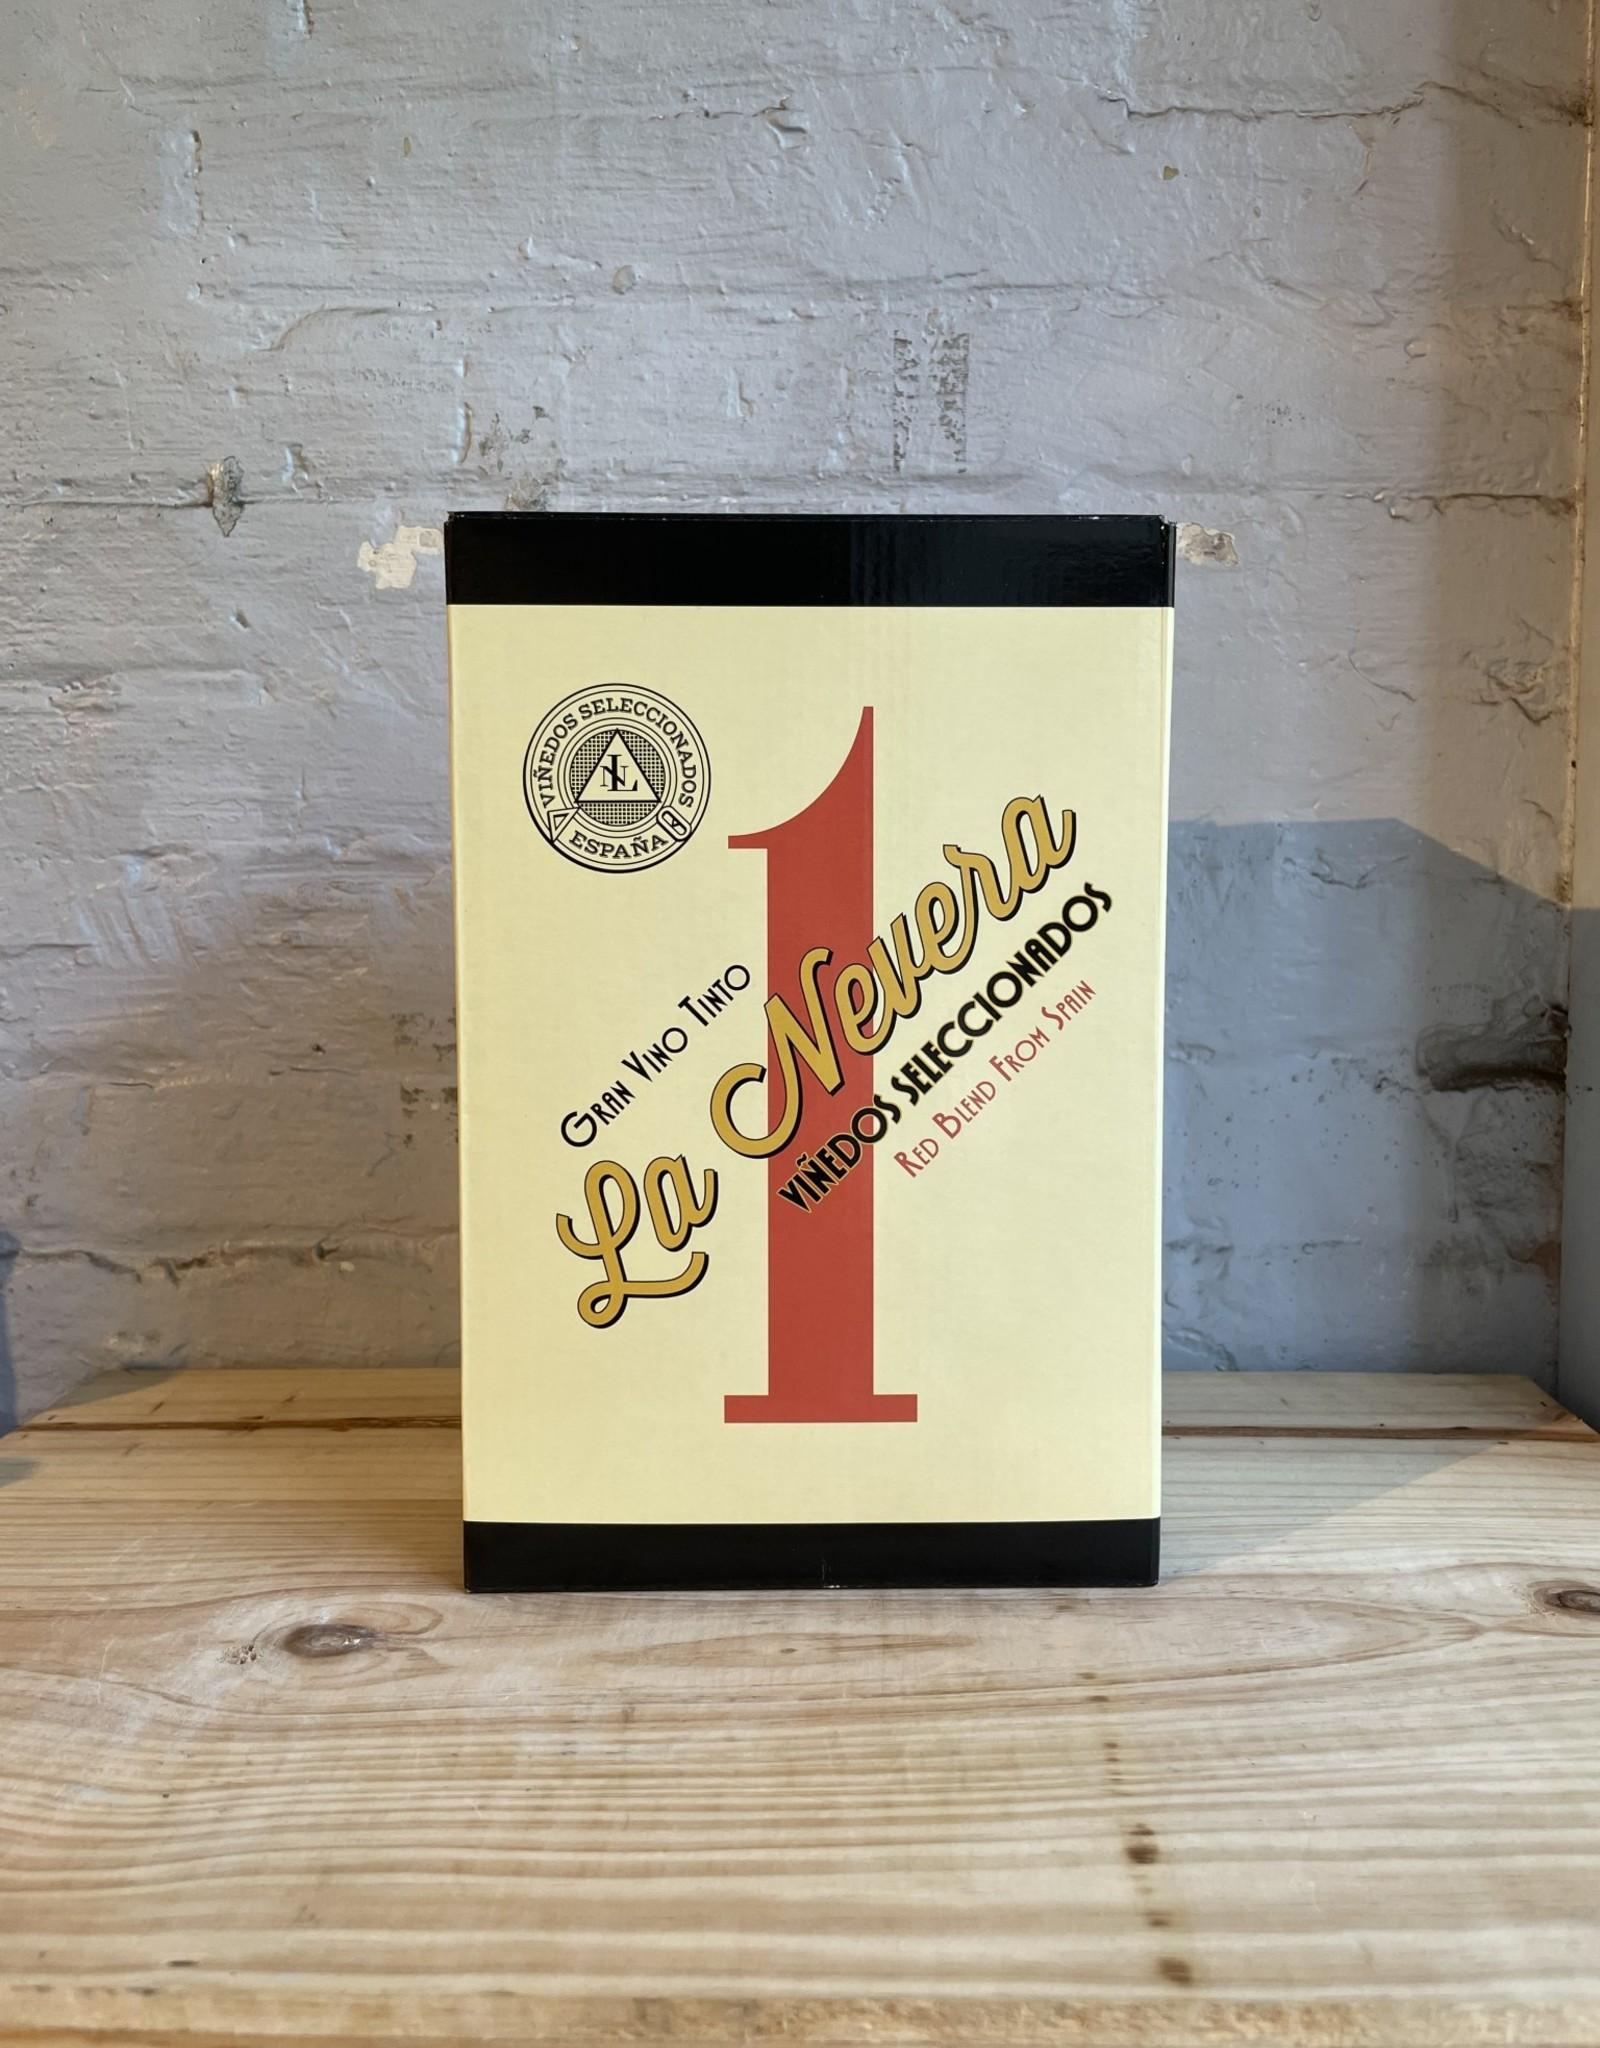 Wine 2020 La Nevera Selecion Especial Gran Vino Tinto - Spain (3L Bag-in-Box)